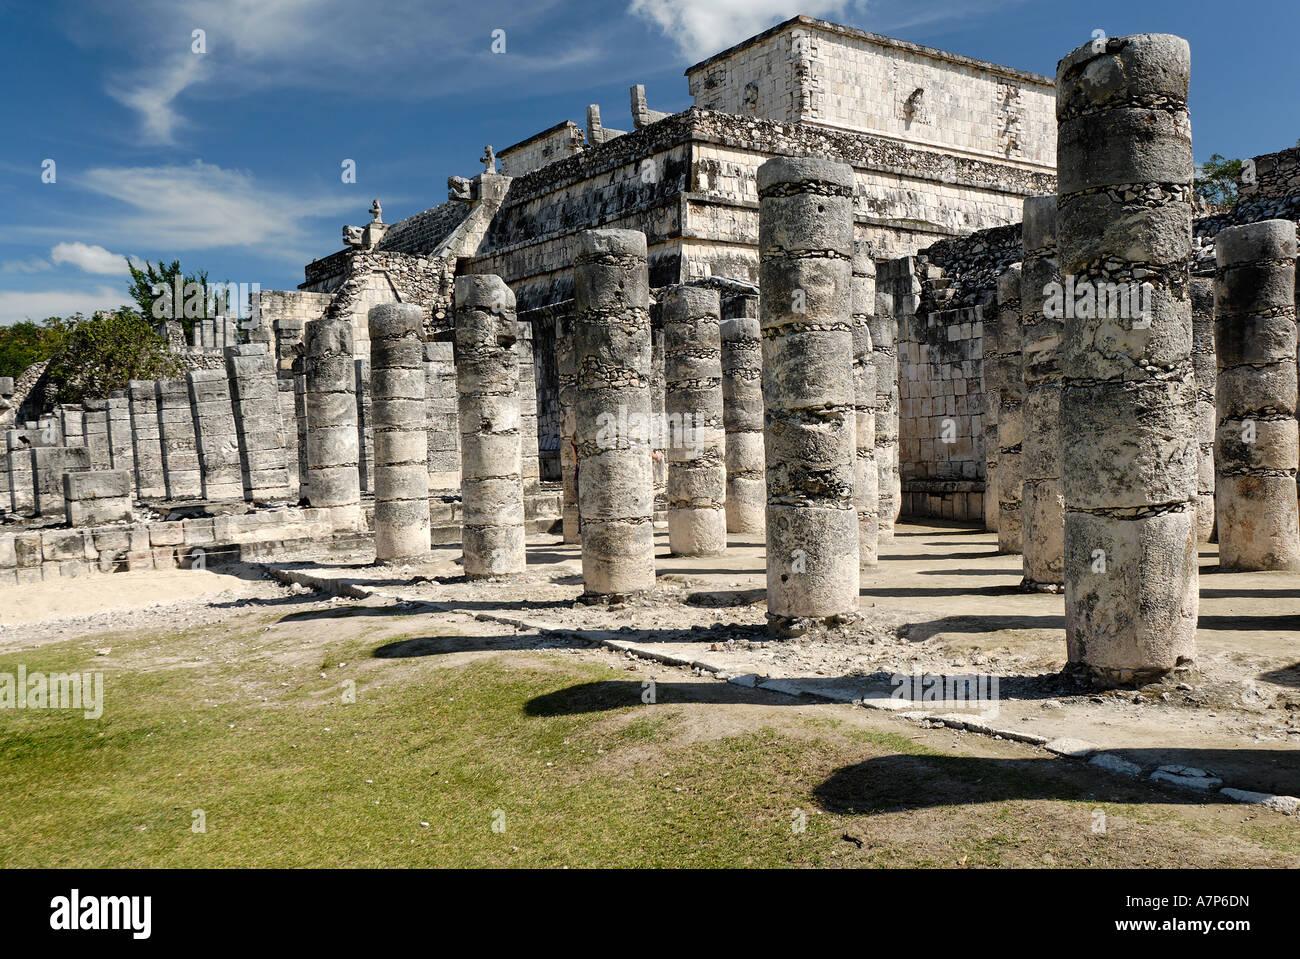 Templo de los Guerreros temple of the warriors Maya and Toltec archeological site Chichen Itza Yucatan Mexico - Stock Image